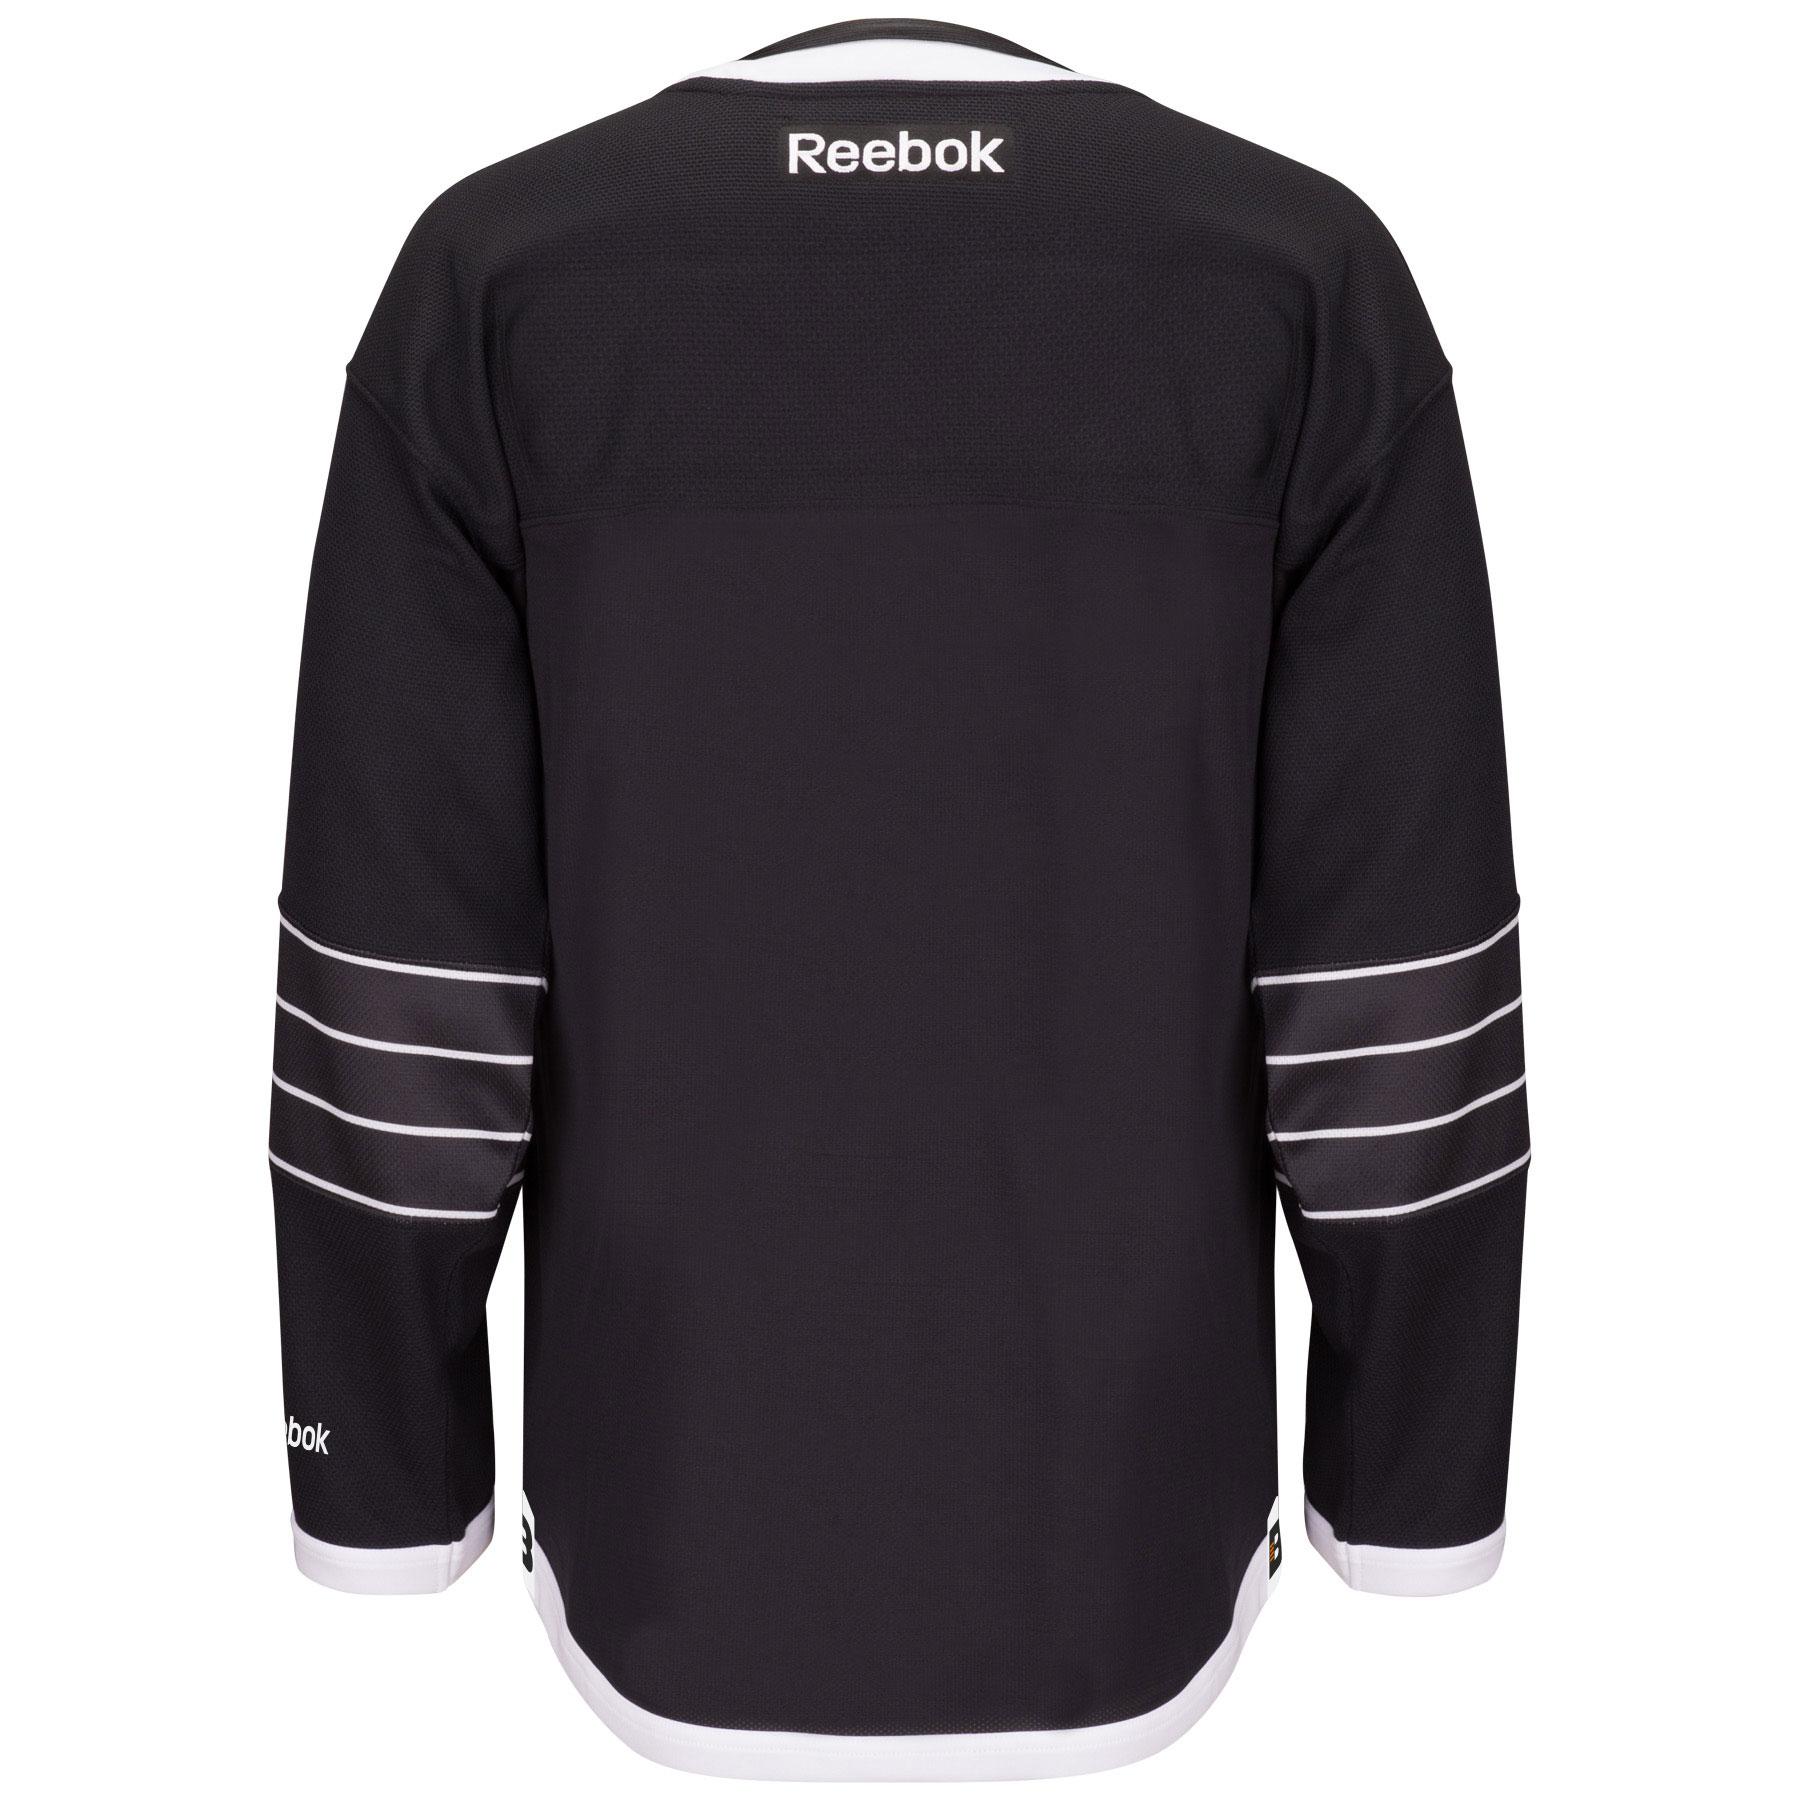 online retailer d9eac b8db7 New York Islanders Reebok Premier Replica Alternate NHL ...